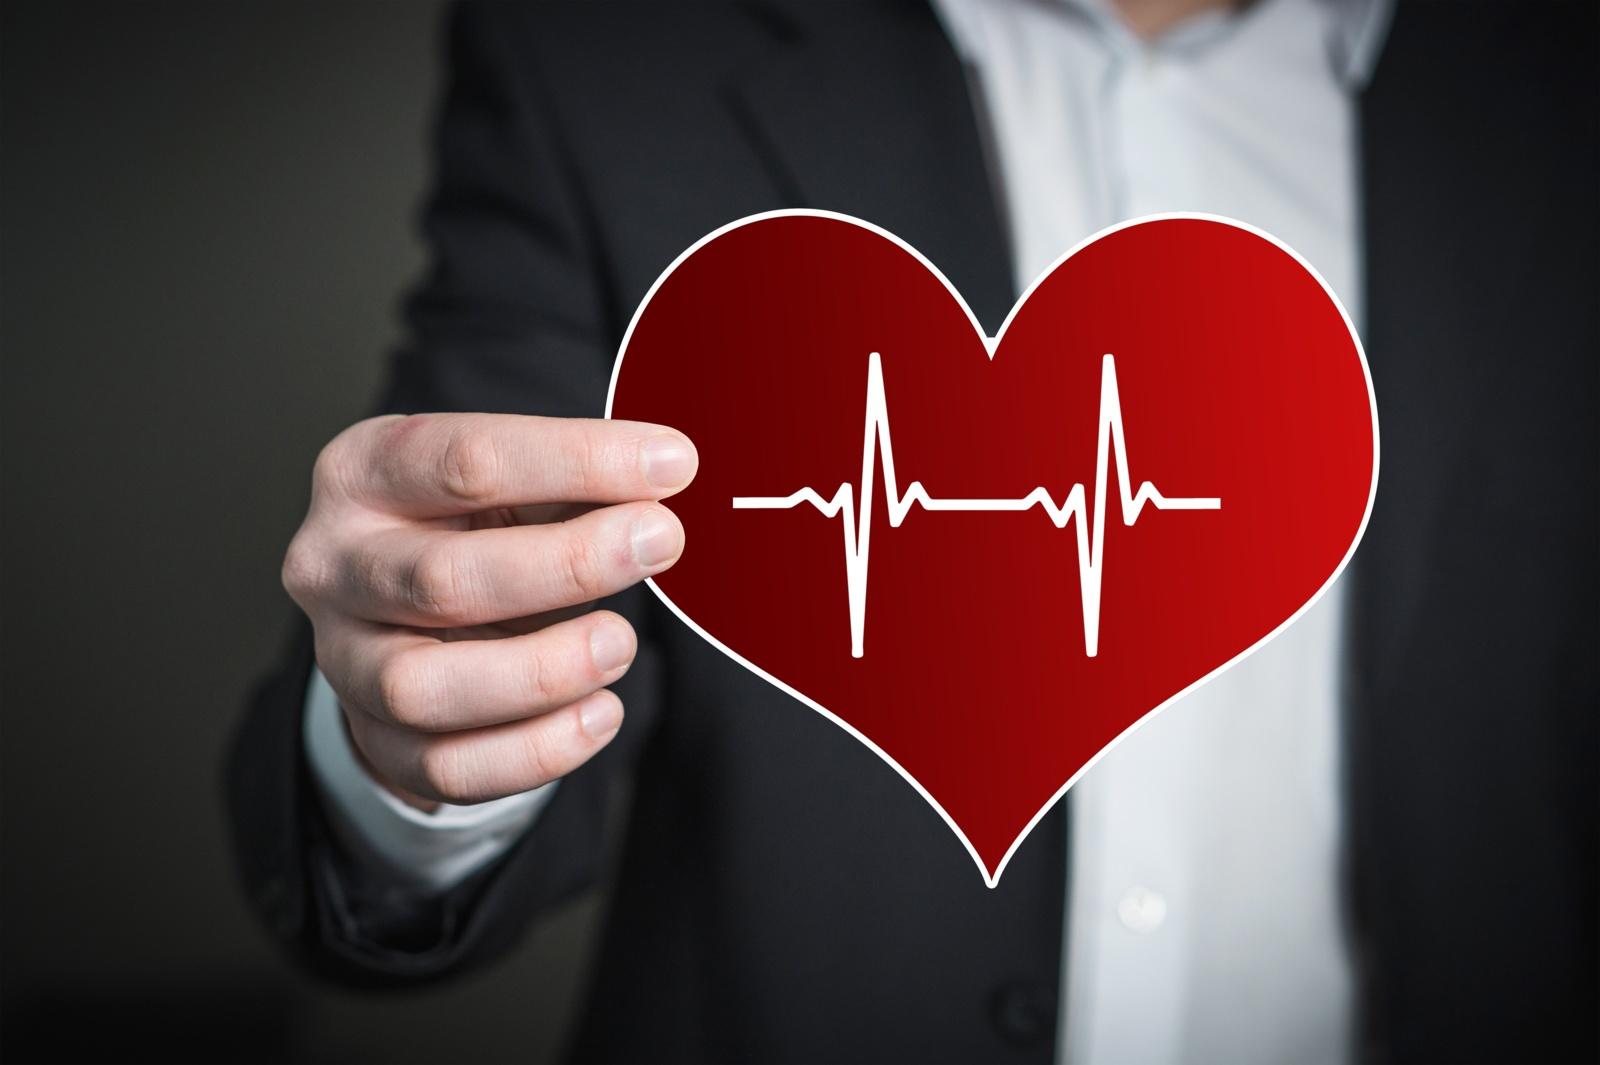 hipertenzijos medicinos profilaktika